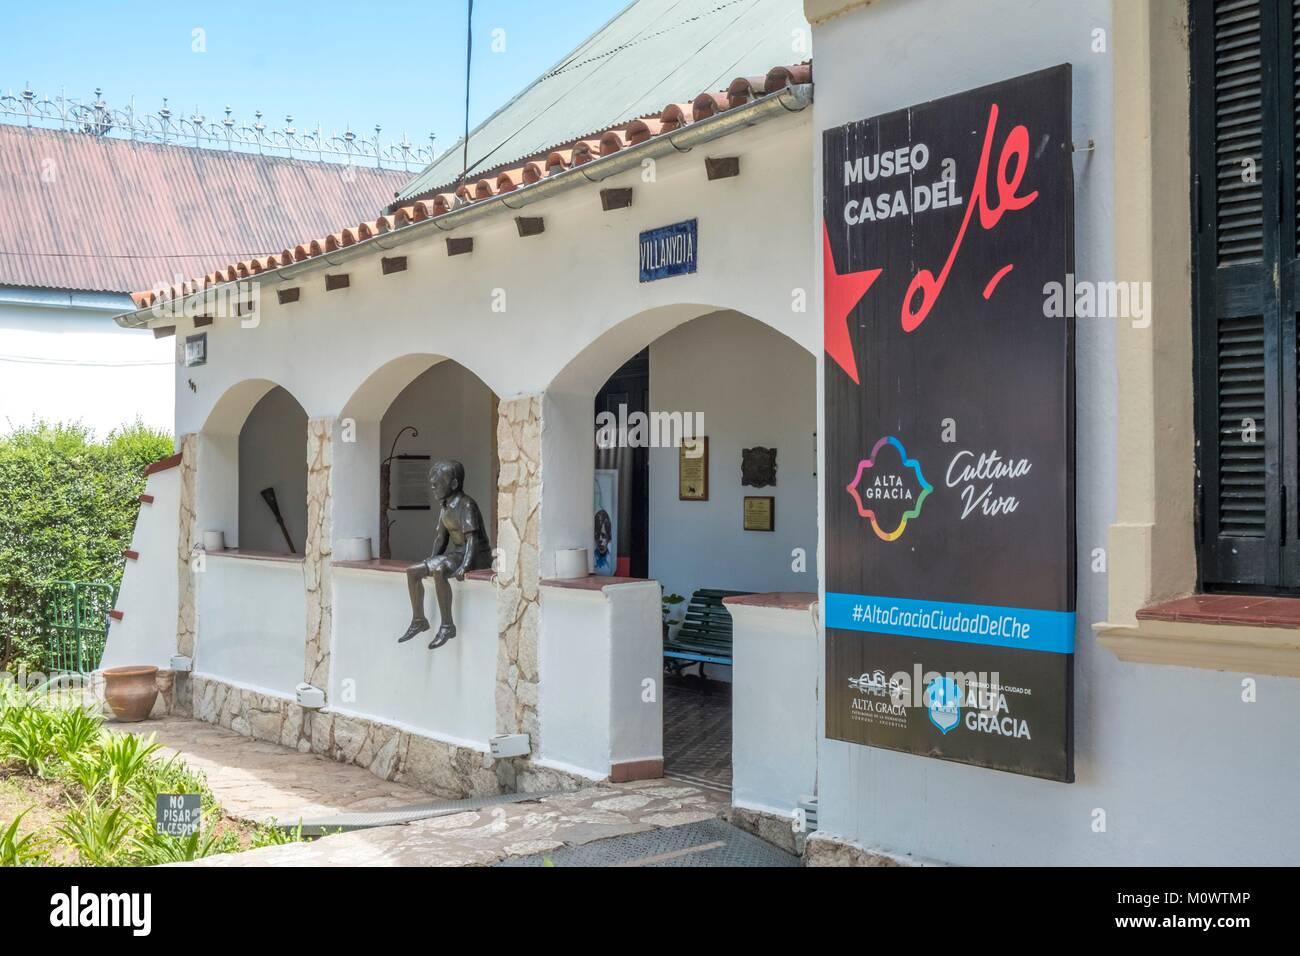 Argentinien, Provinz Córdoba, Alta Maria, Che Guevara Museum, das Museo del Che Guevara Stockbild